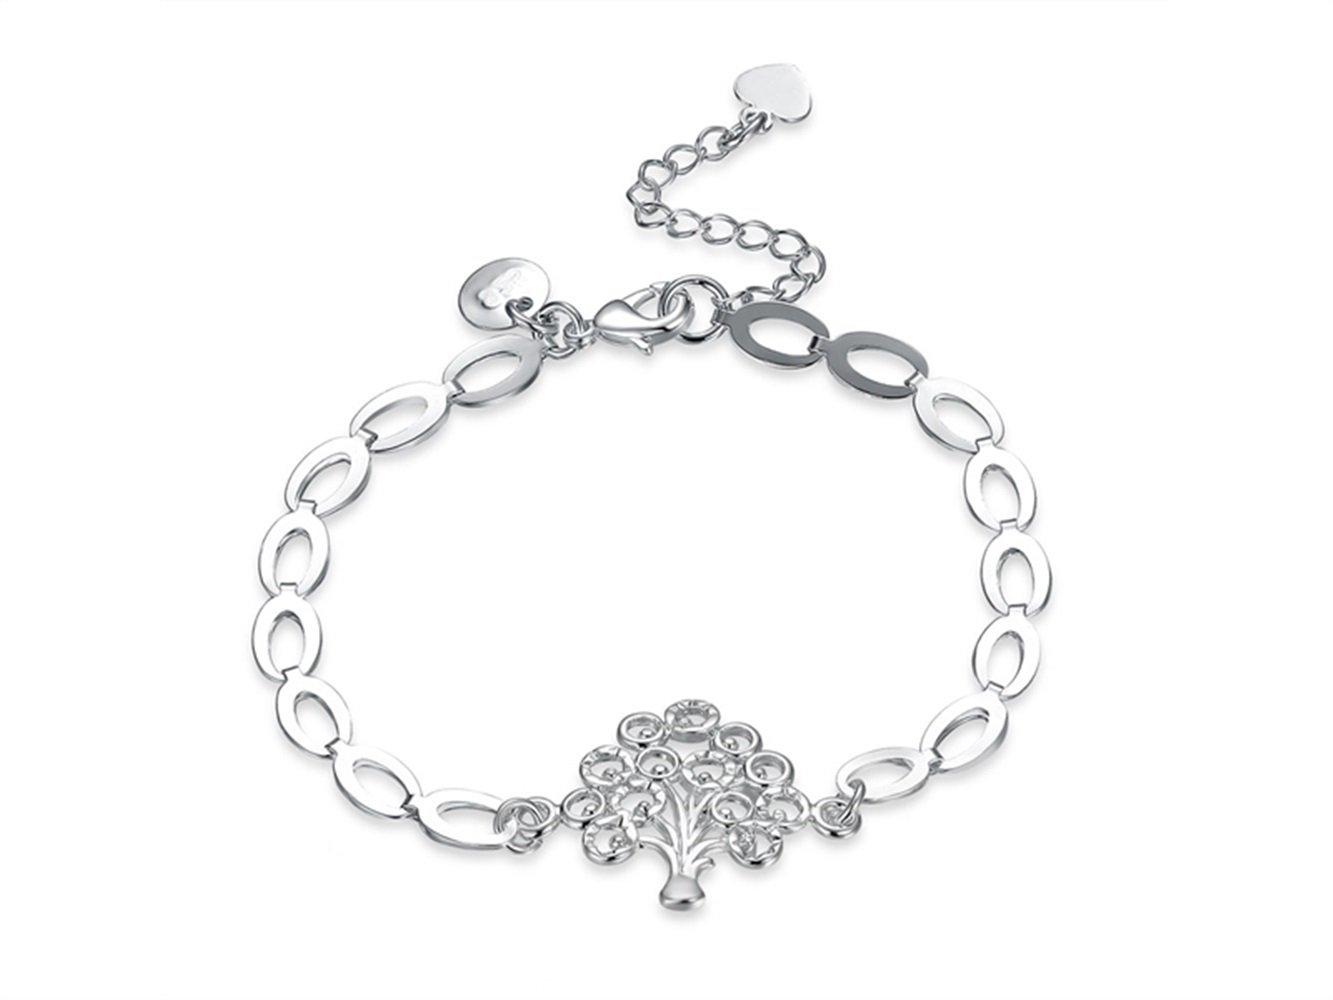 JKHGJUH Alla moda Bracciale a forma di bracciale con pendente a catena regolabile a catena regolabile da donna